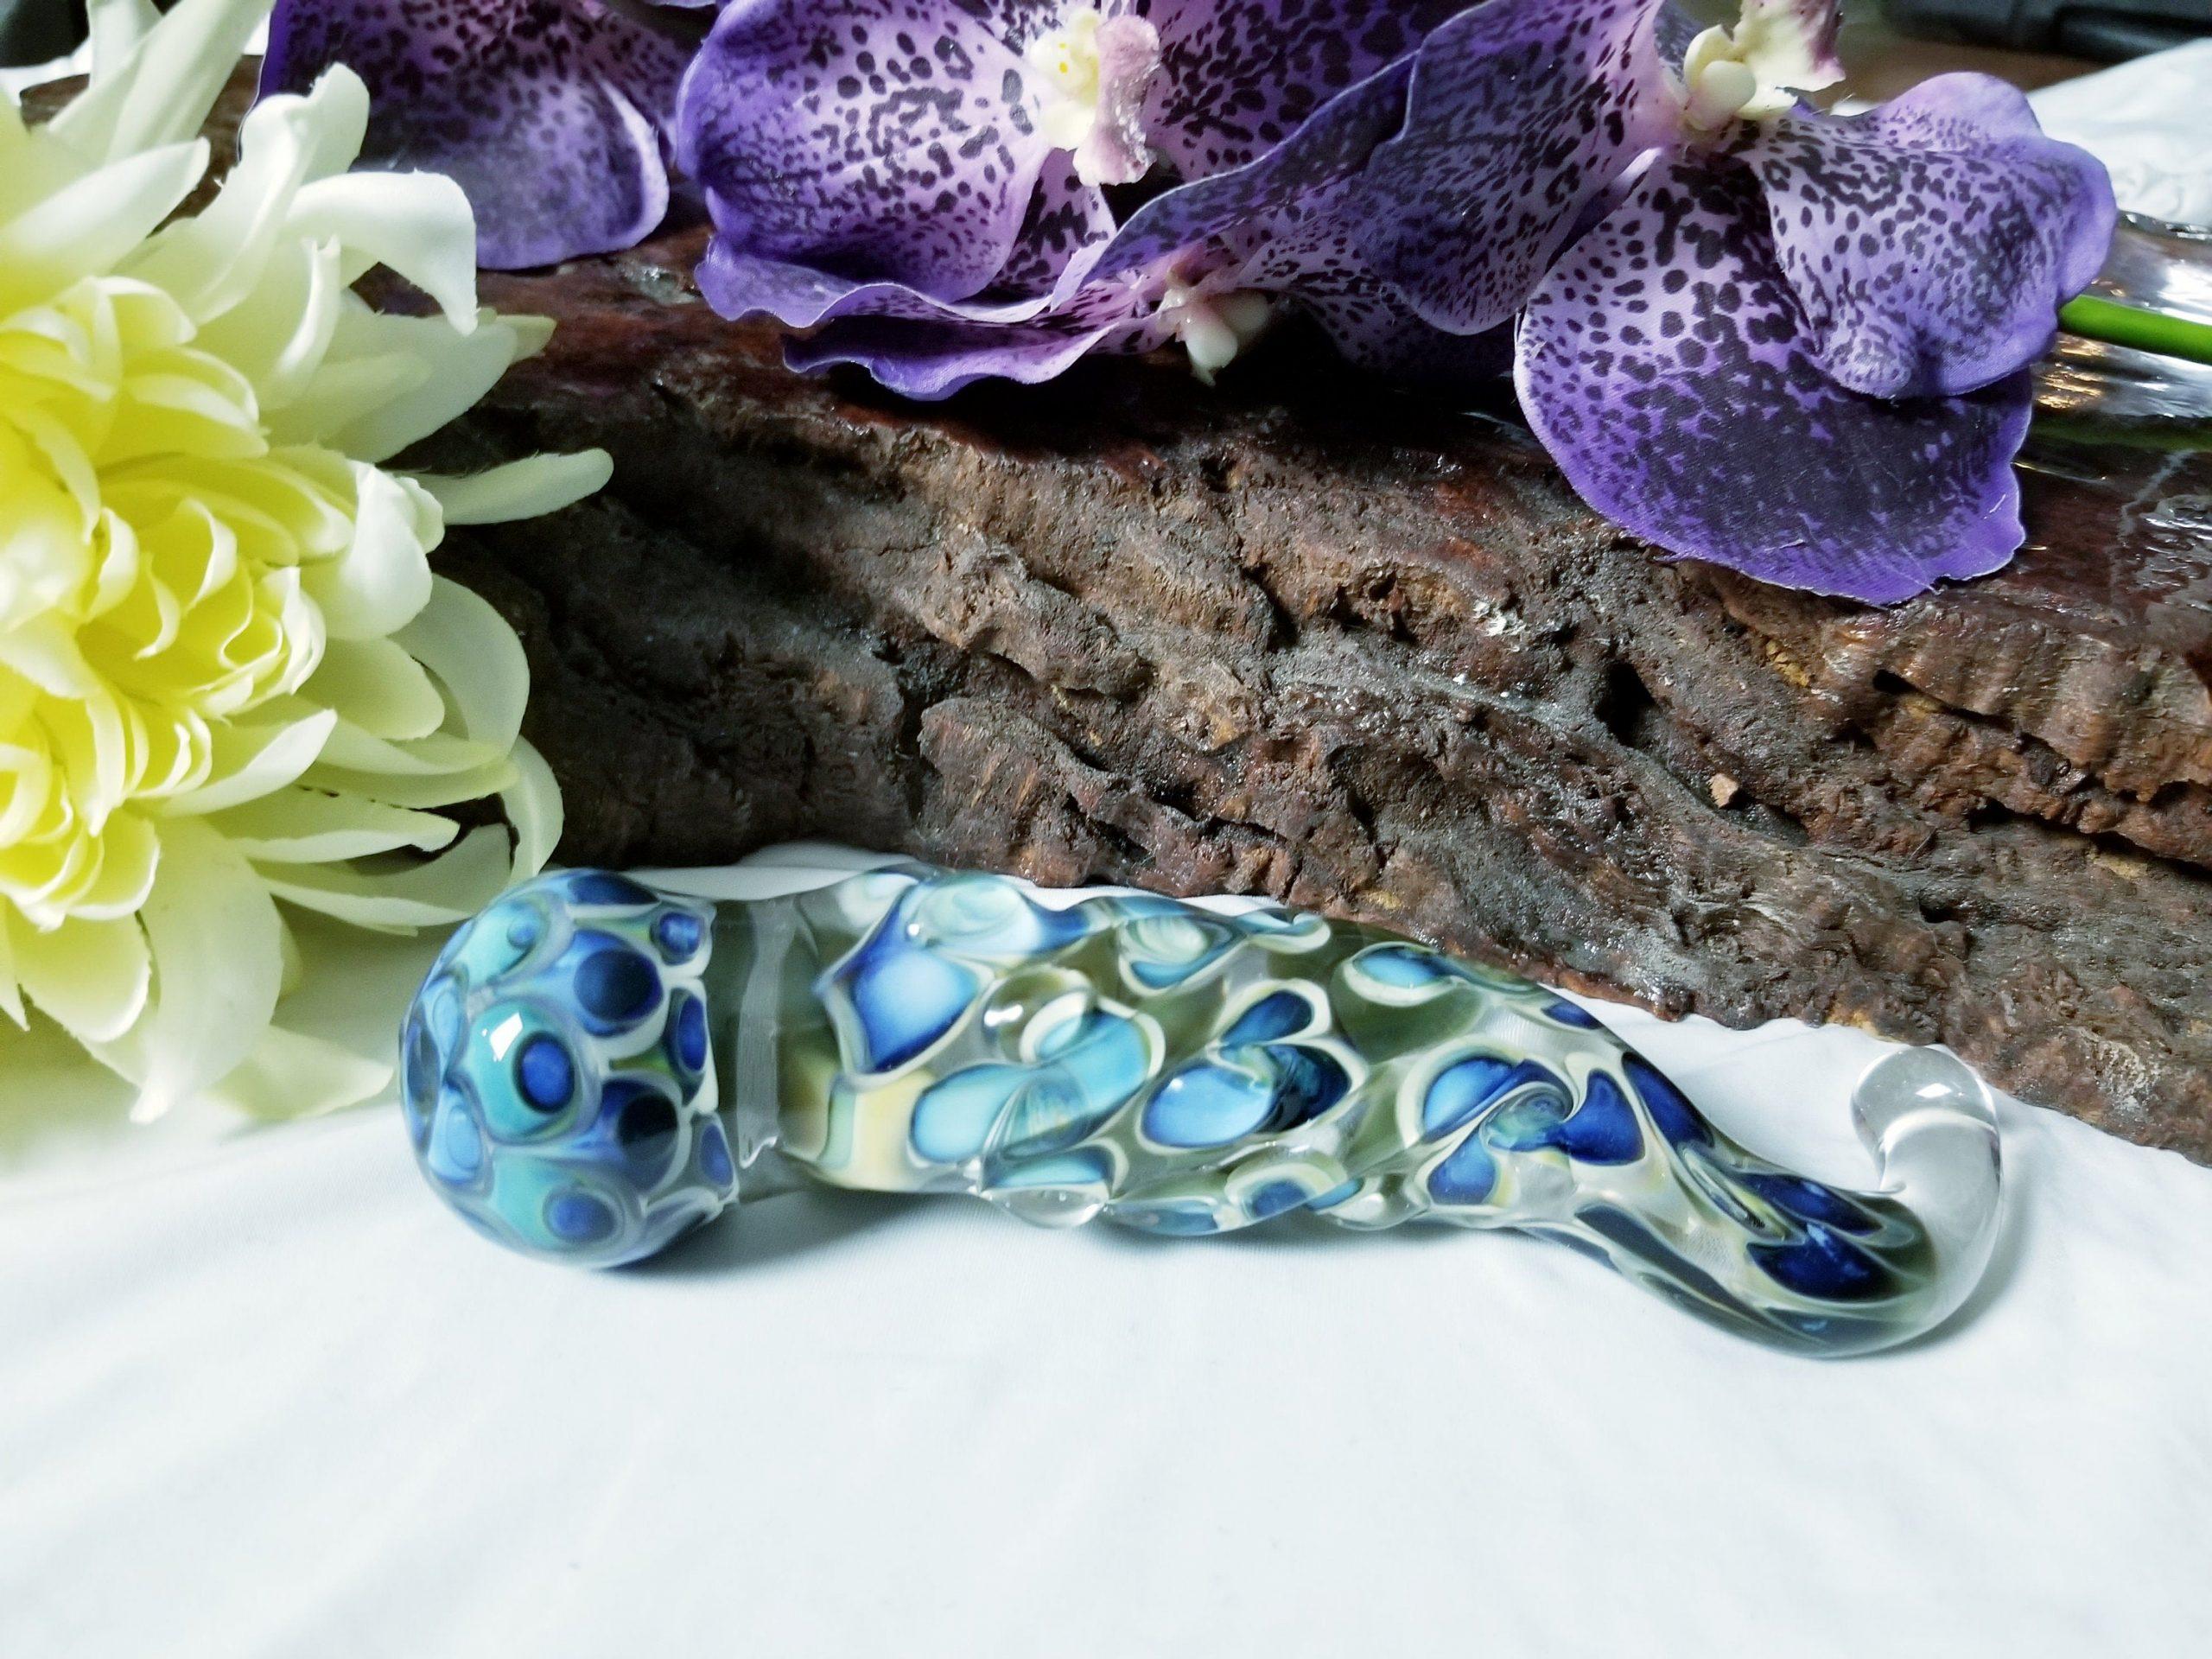 Glass Dildo P Spot G Spot Sex ToyTantra Tools Heavyweight thick large dotstack textured handmade glass dildo